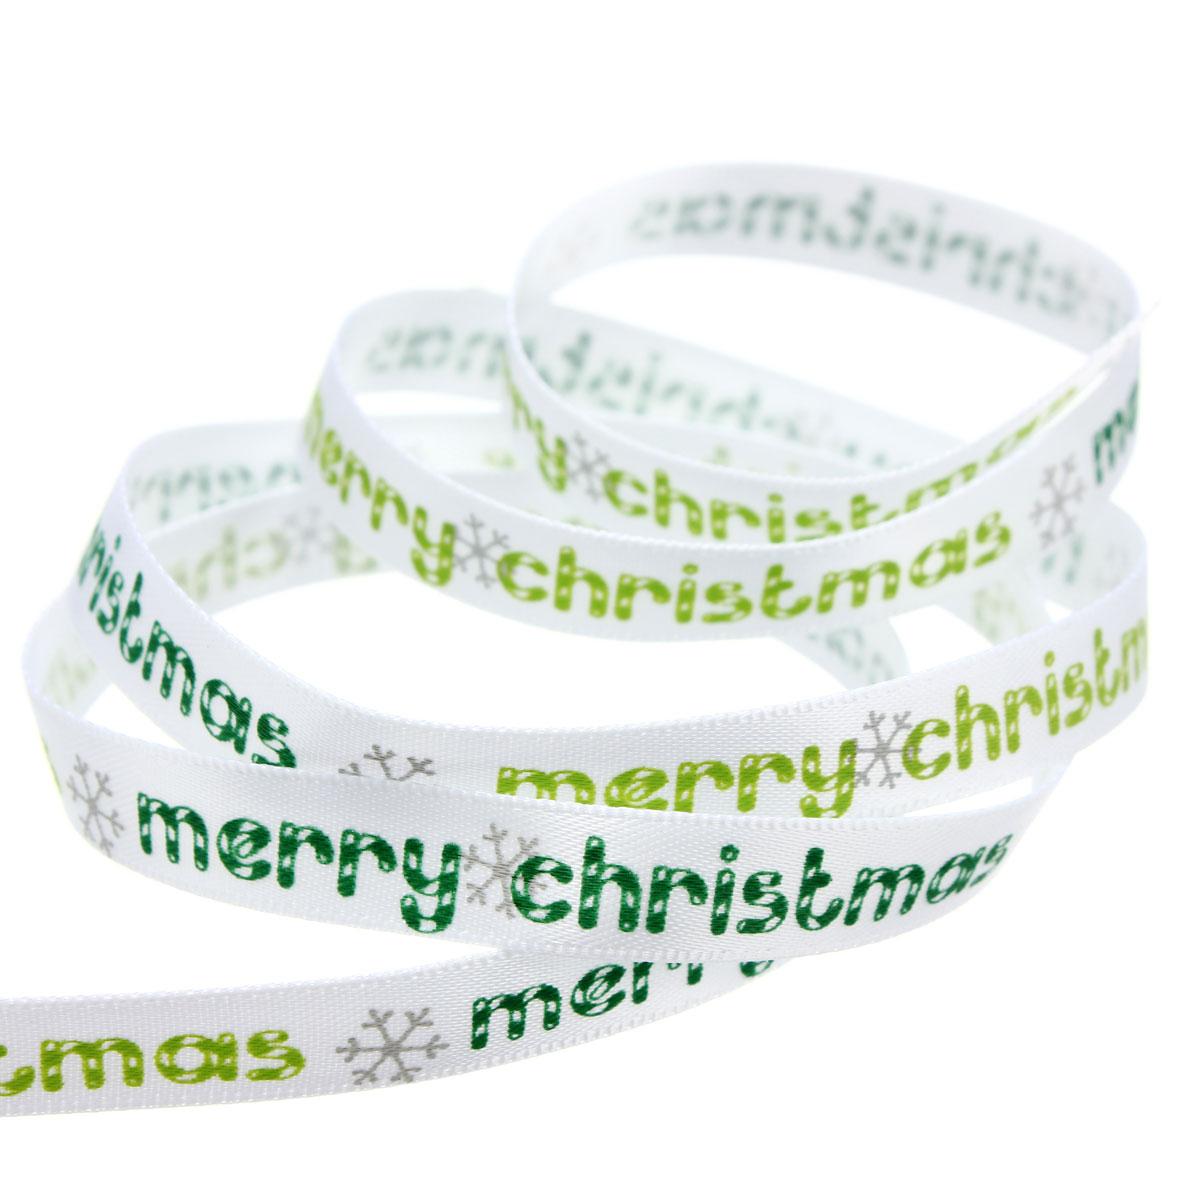 5 Yard 10mm Printed Merry Christmas Tree Grosgrain Ribbon DIY Craft